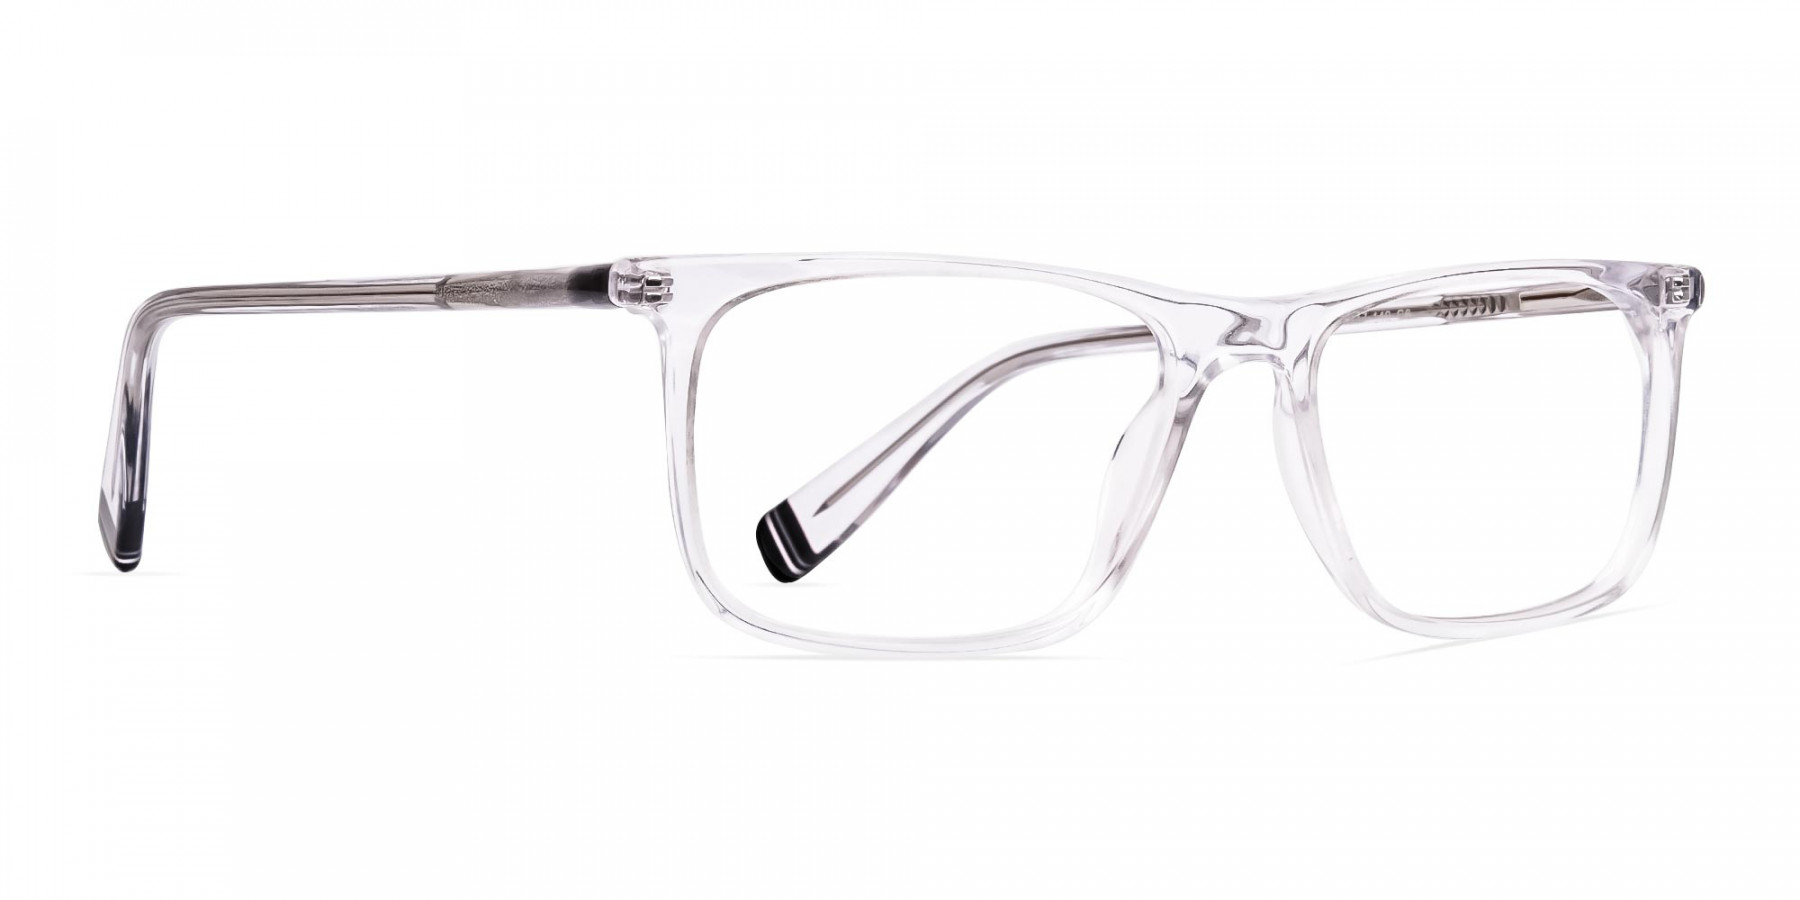 transparent-glasses-rectangular-shape -frames-1